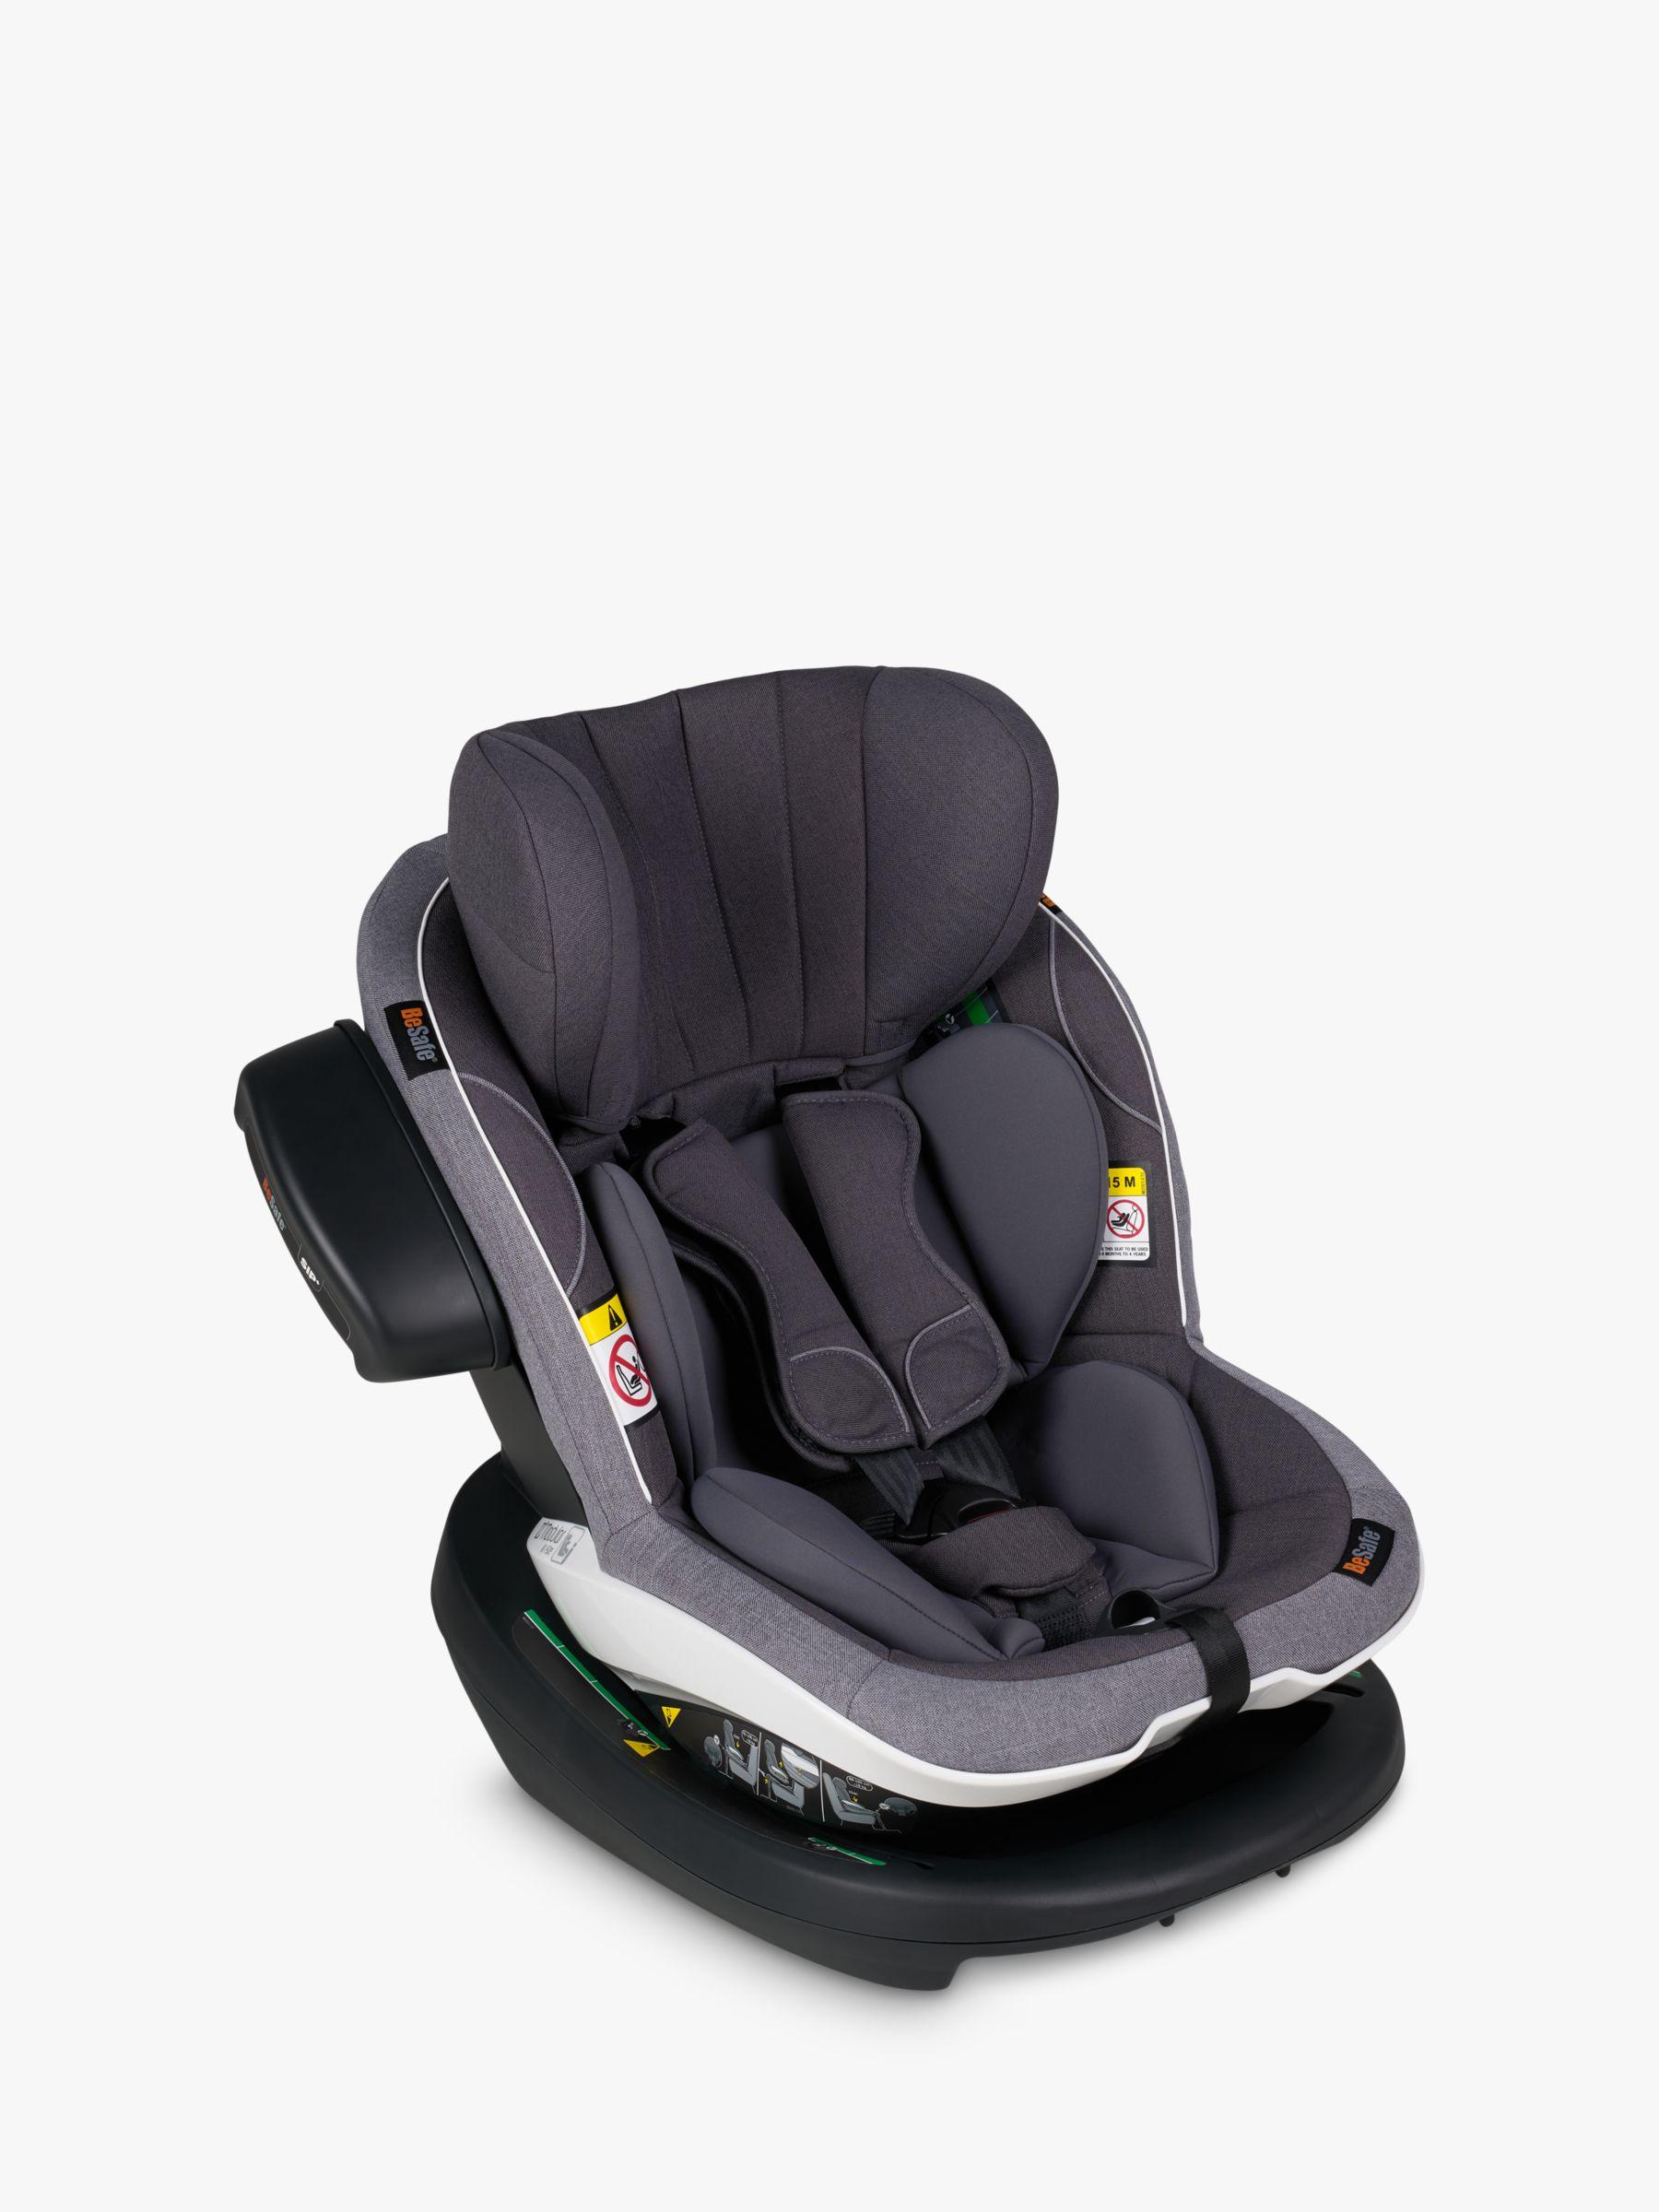 BeSafe BeSafe iZi Modular X1 i-Size Group 1 Car Seat, Metallic Melange